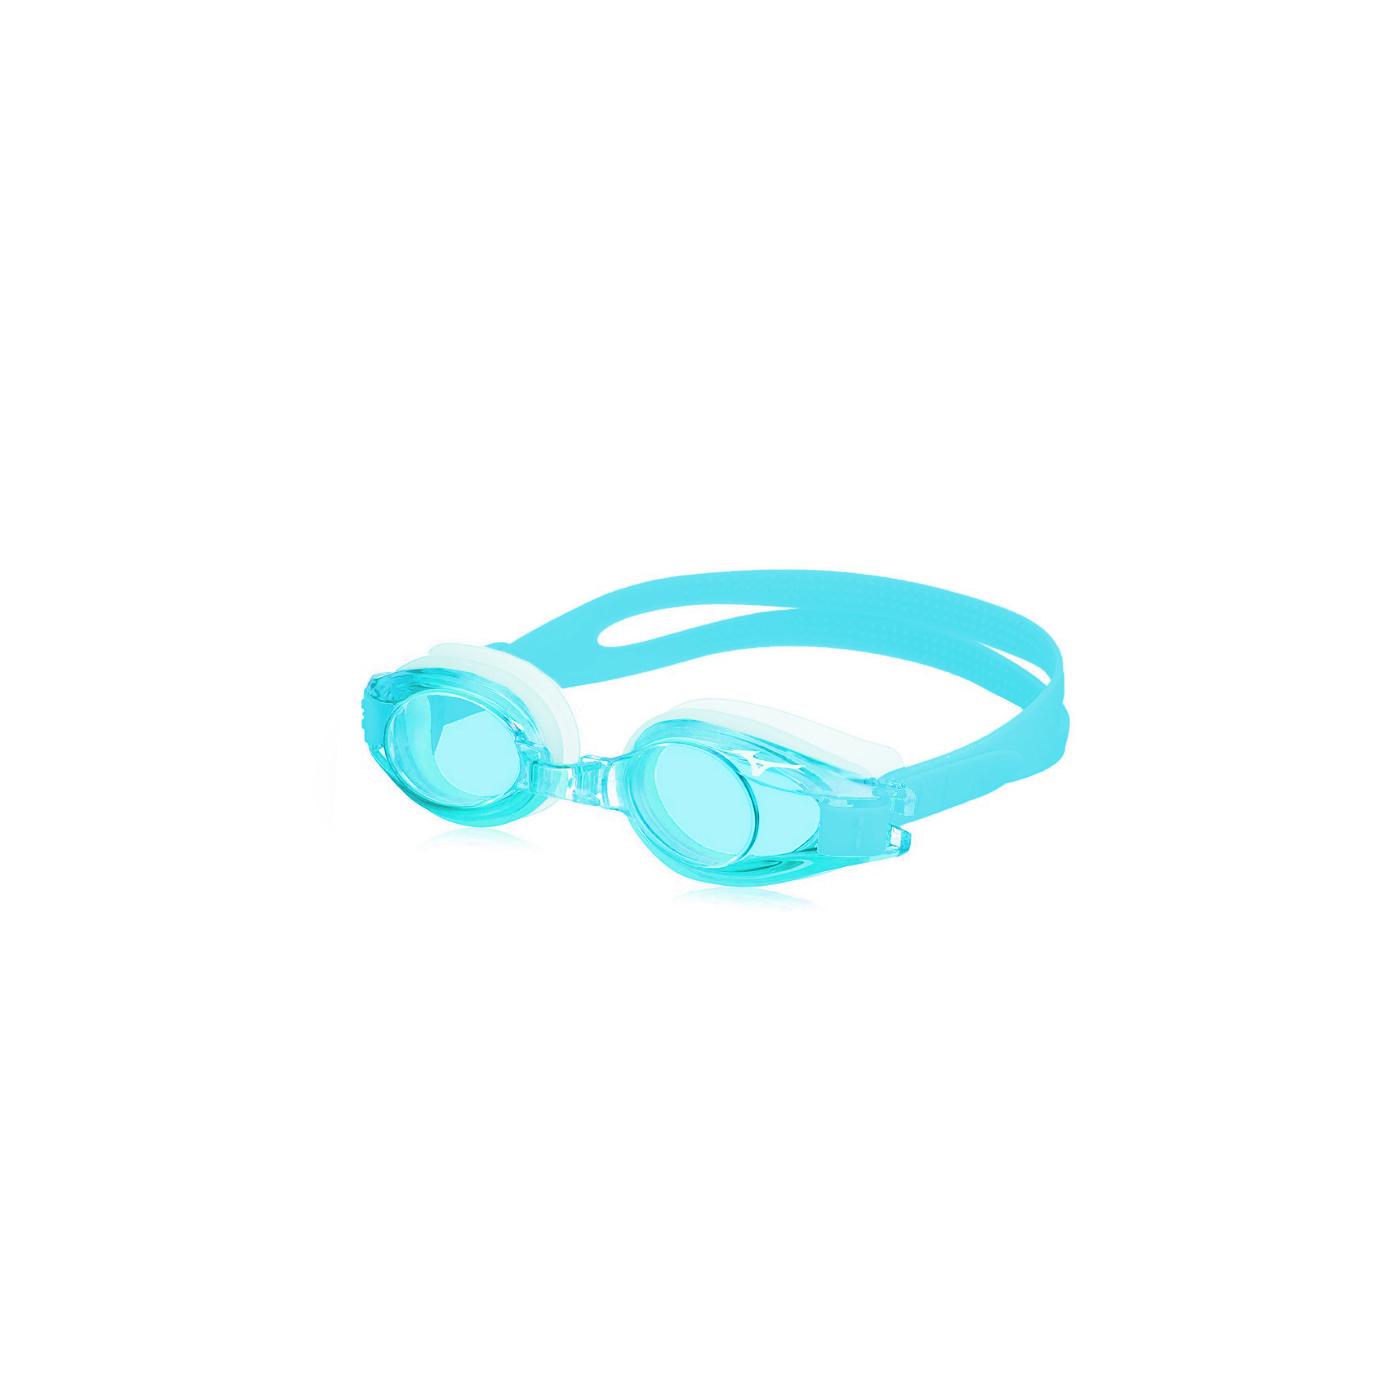 MIZUNO 兒童泳鏡  SWIMN3JF600000-09 - 水藍